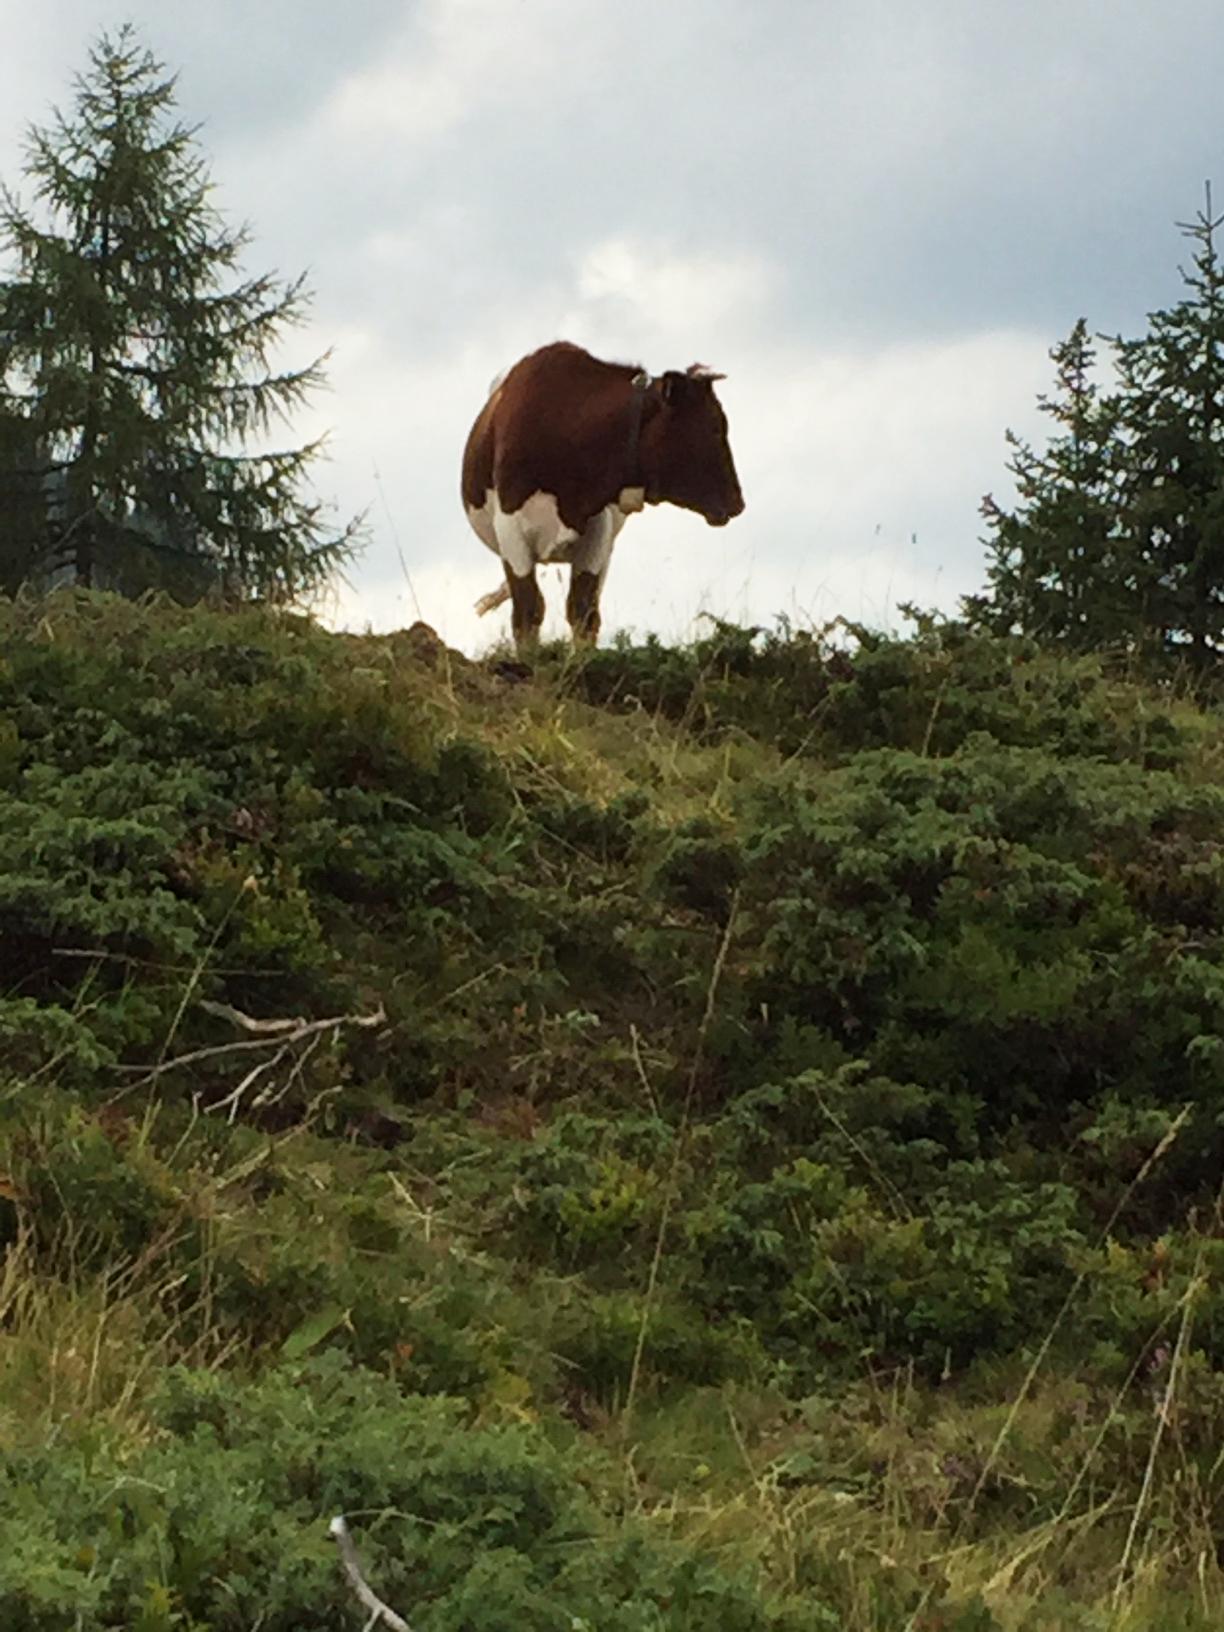 Kuh auf Almweide